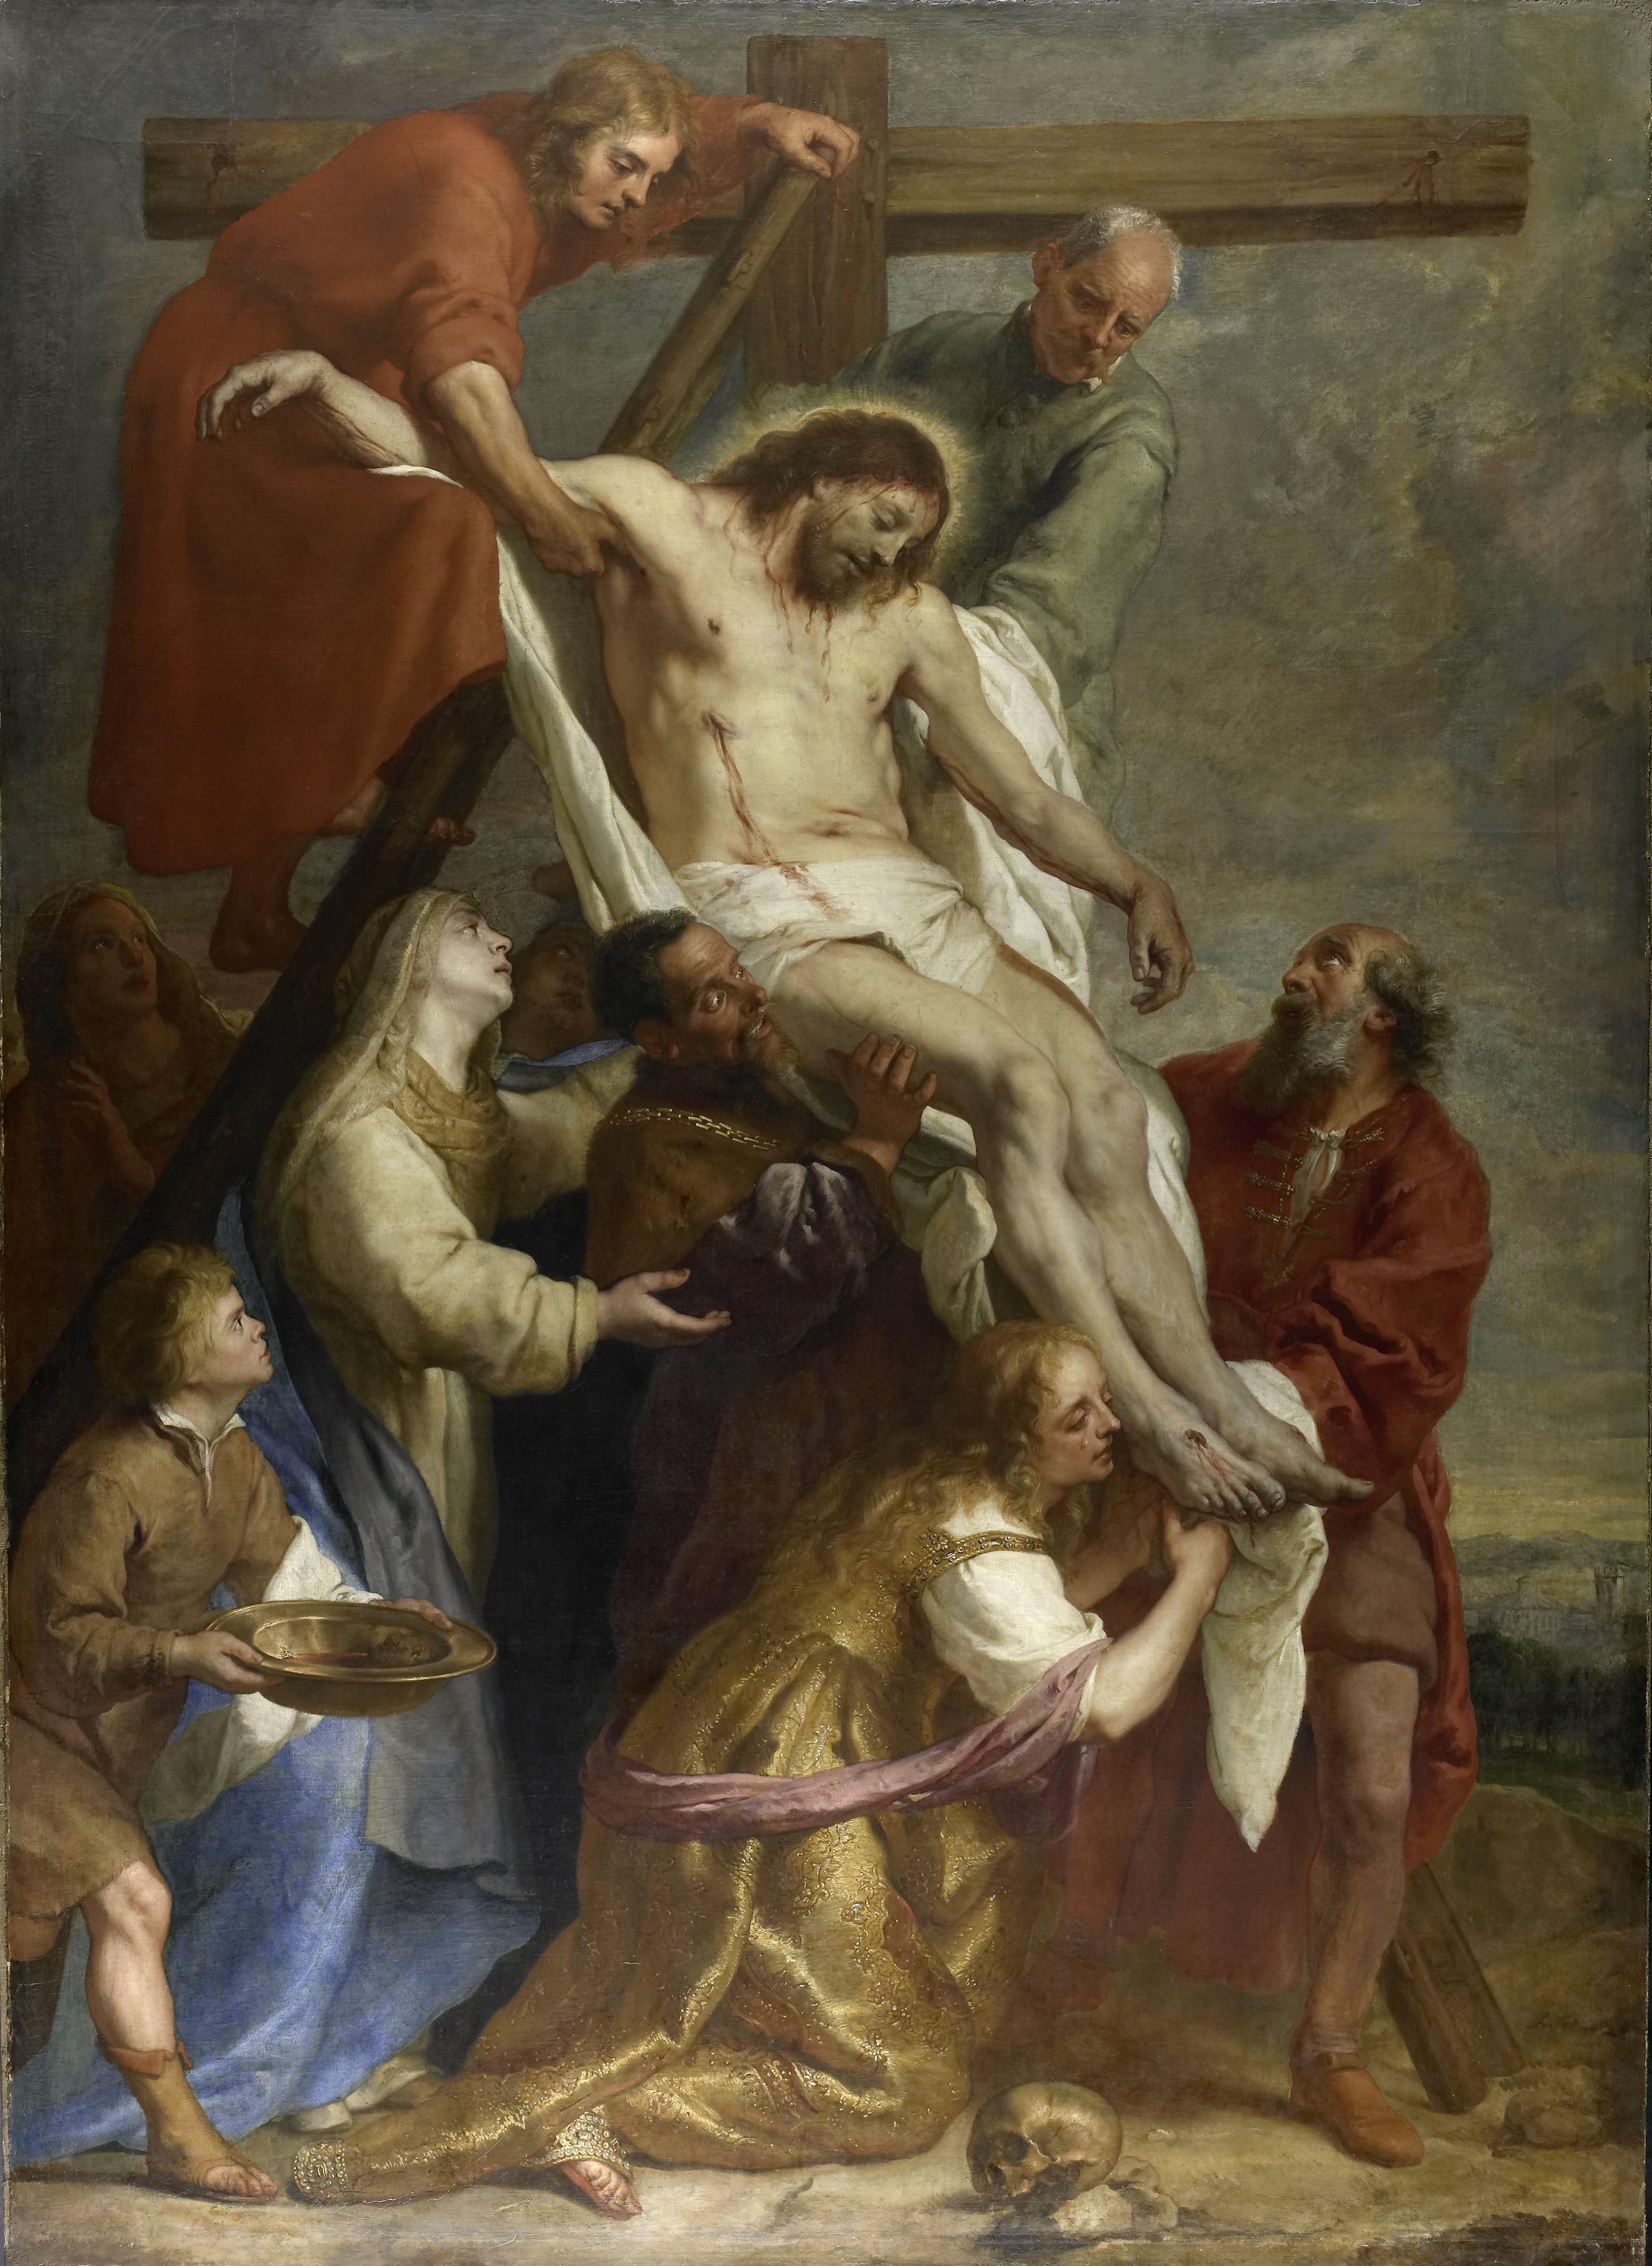 The Descent from the Cross, by Gaspar de Crayer, c. 1630 - 1669. Rijksmuseum, Amsterdam, Netherlands. Via IllustratedPrayer.com